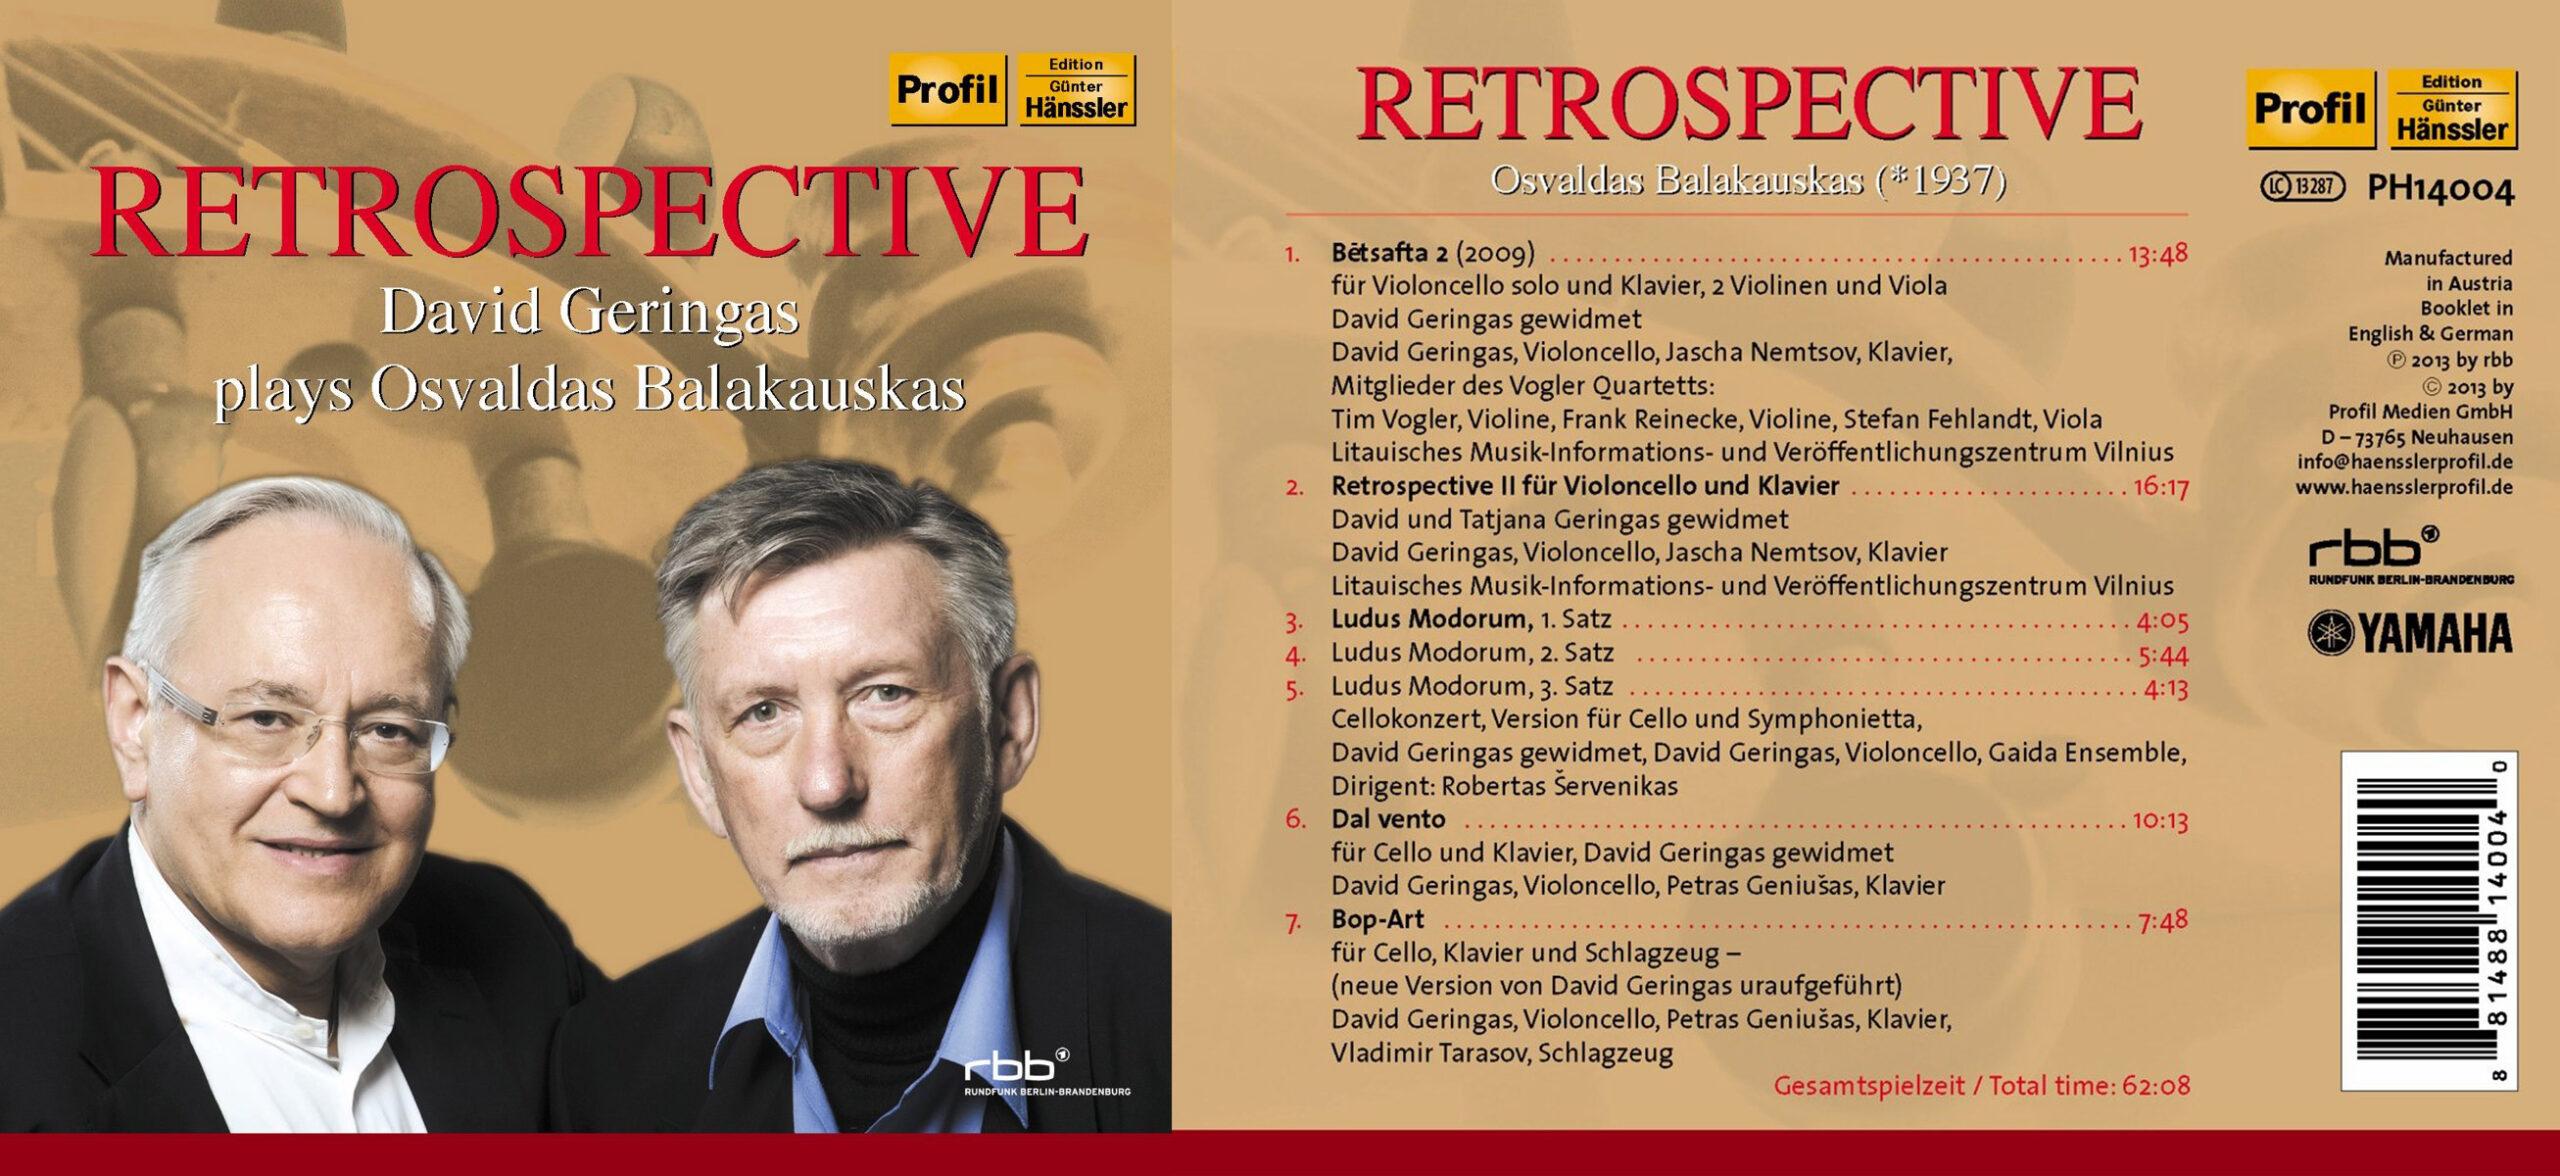 Berliner Zeitung – Retrospective, David Geringas Plays Osvaldas Balakauskas